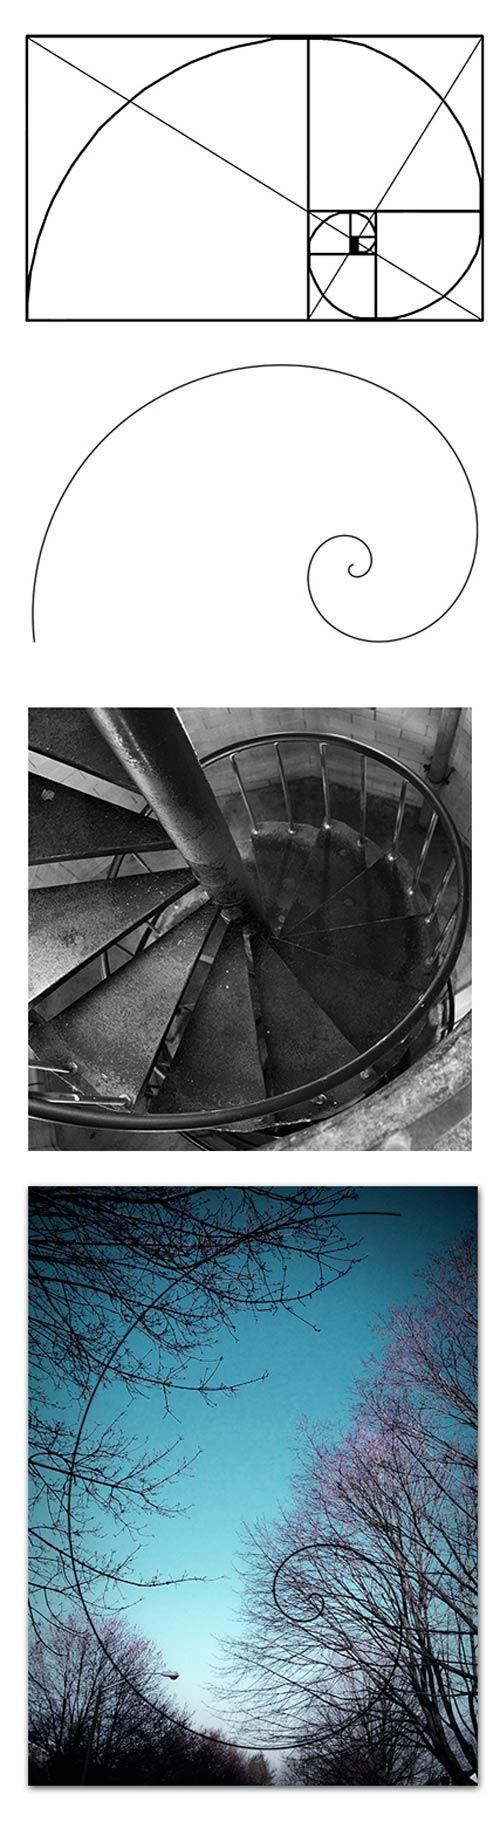 golden spiral 2 - نسبت طلایی در عکاسی